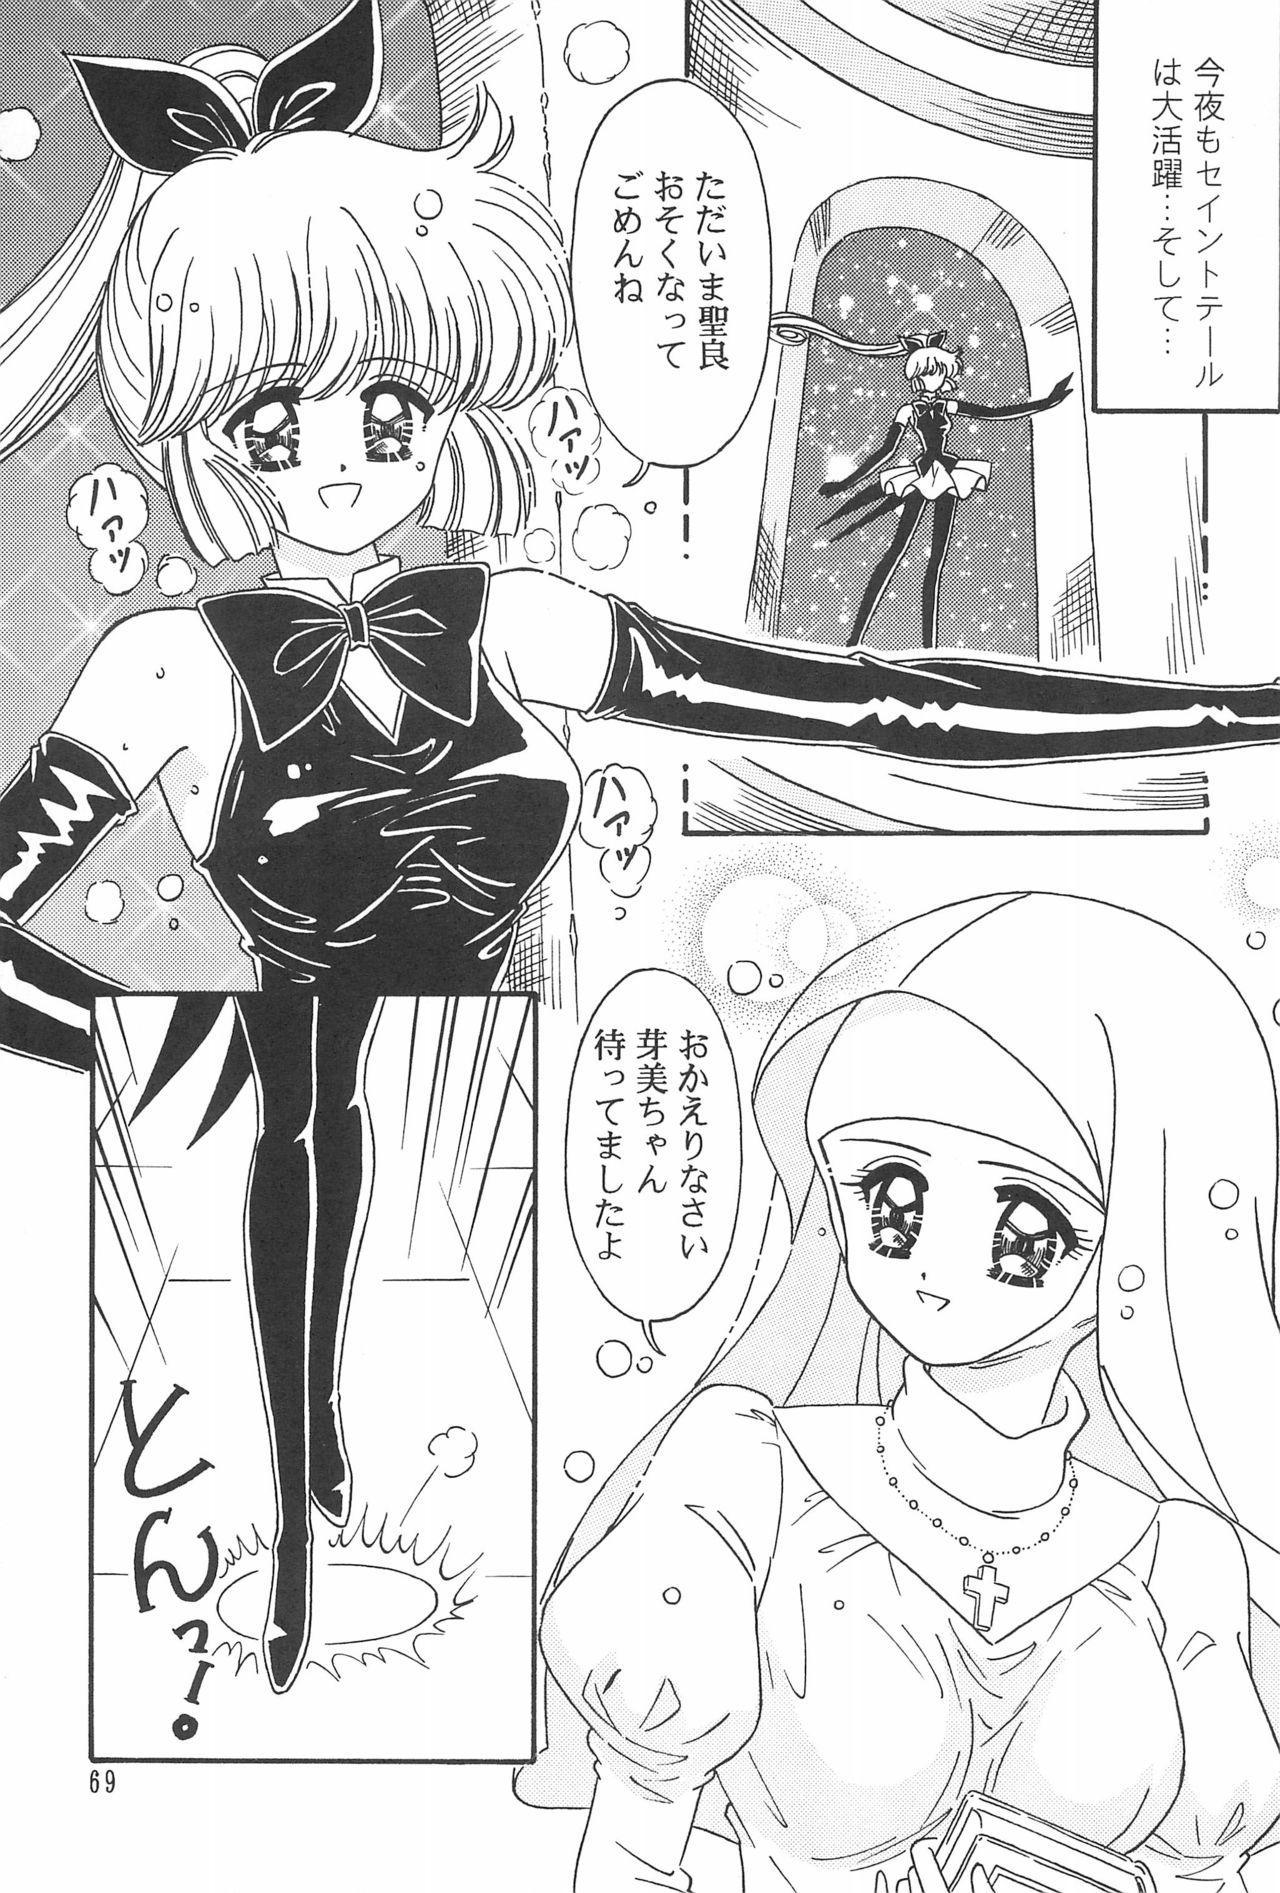 Showbaku 70